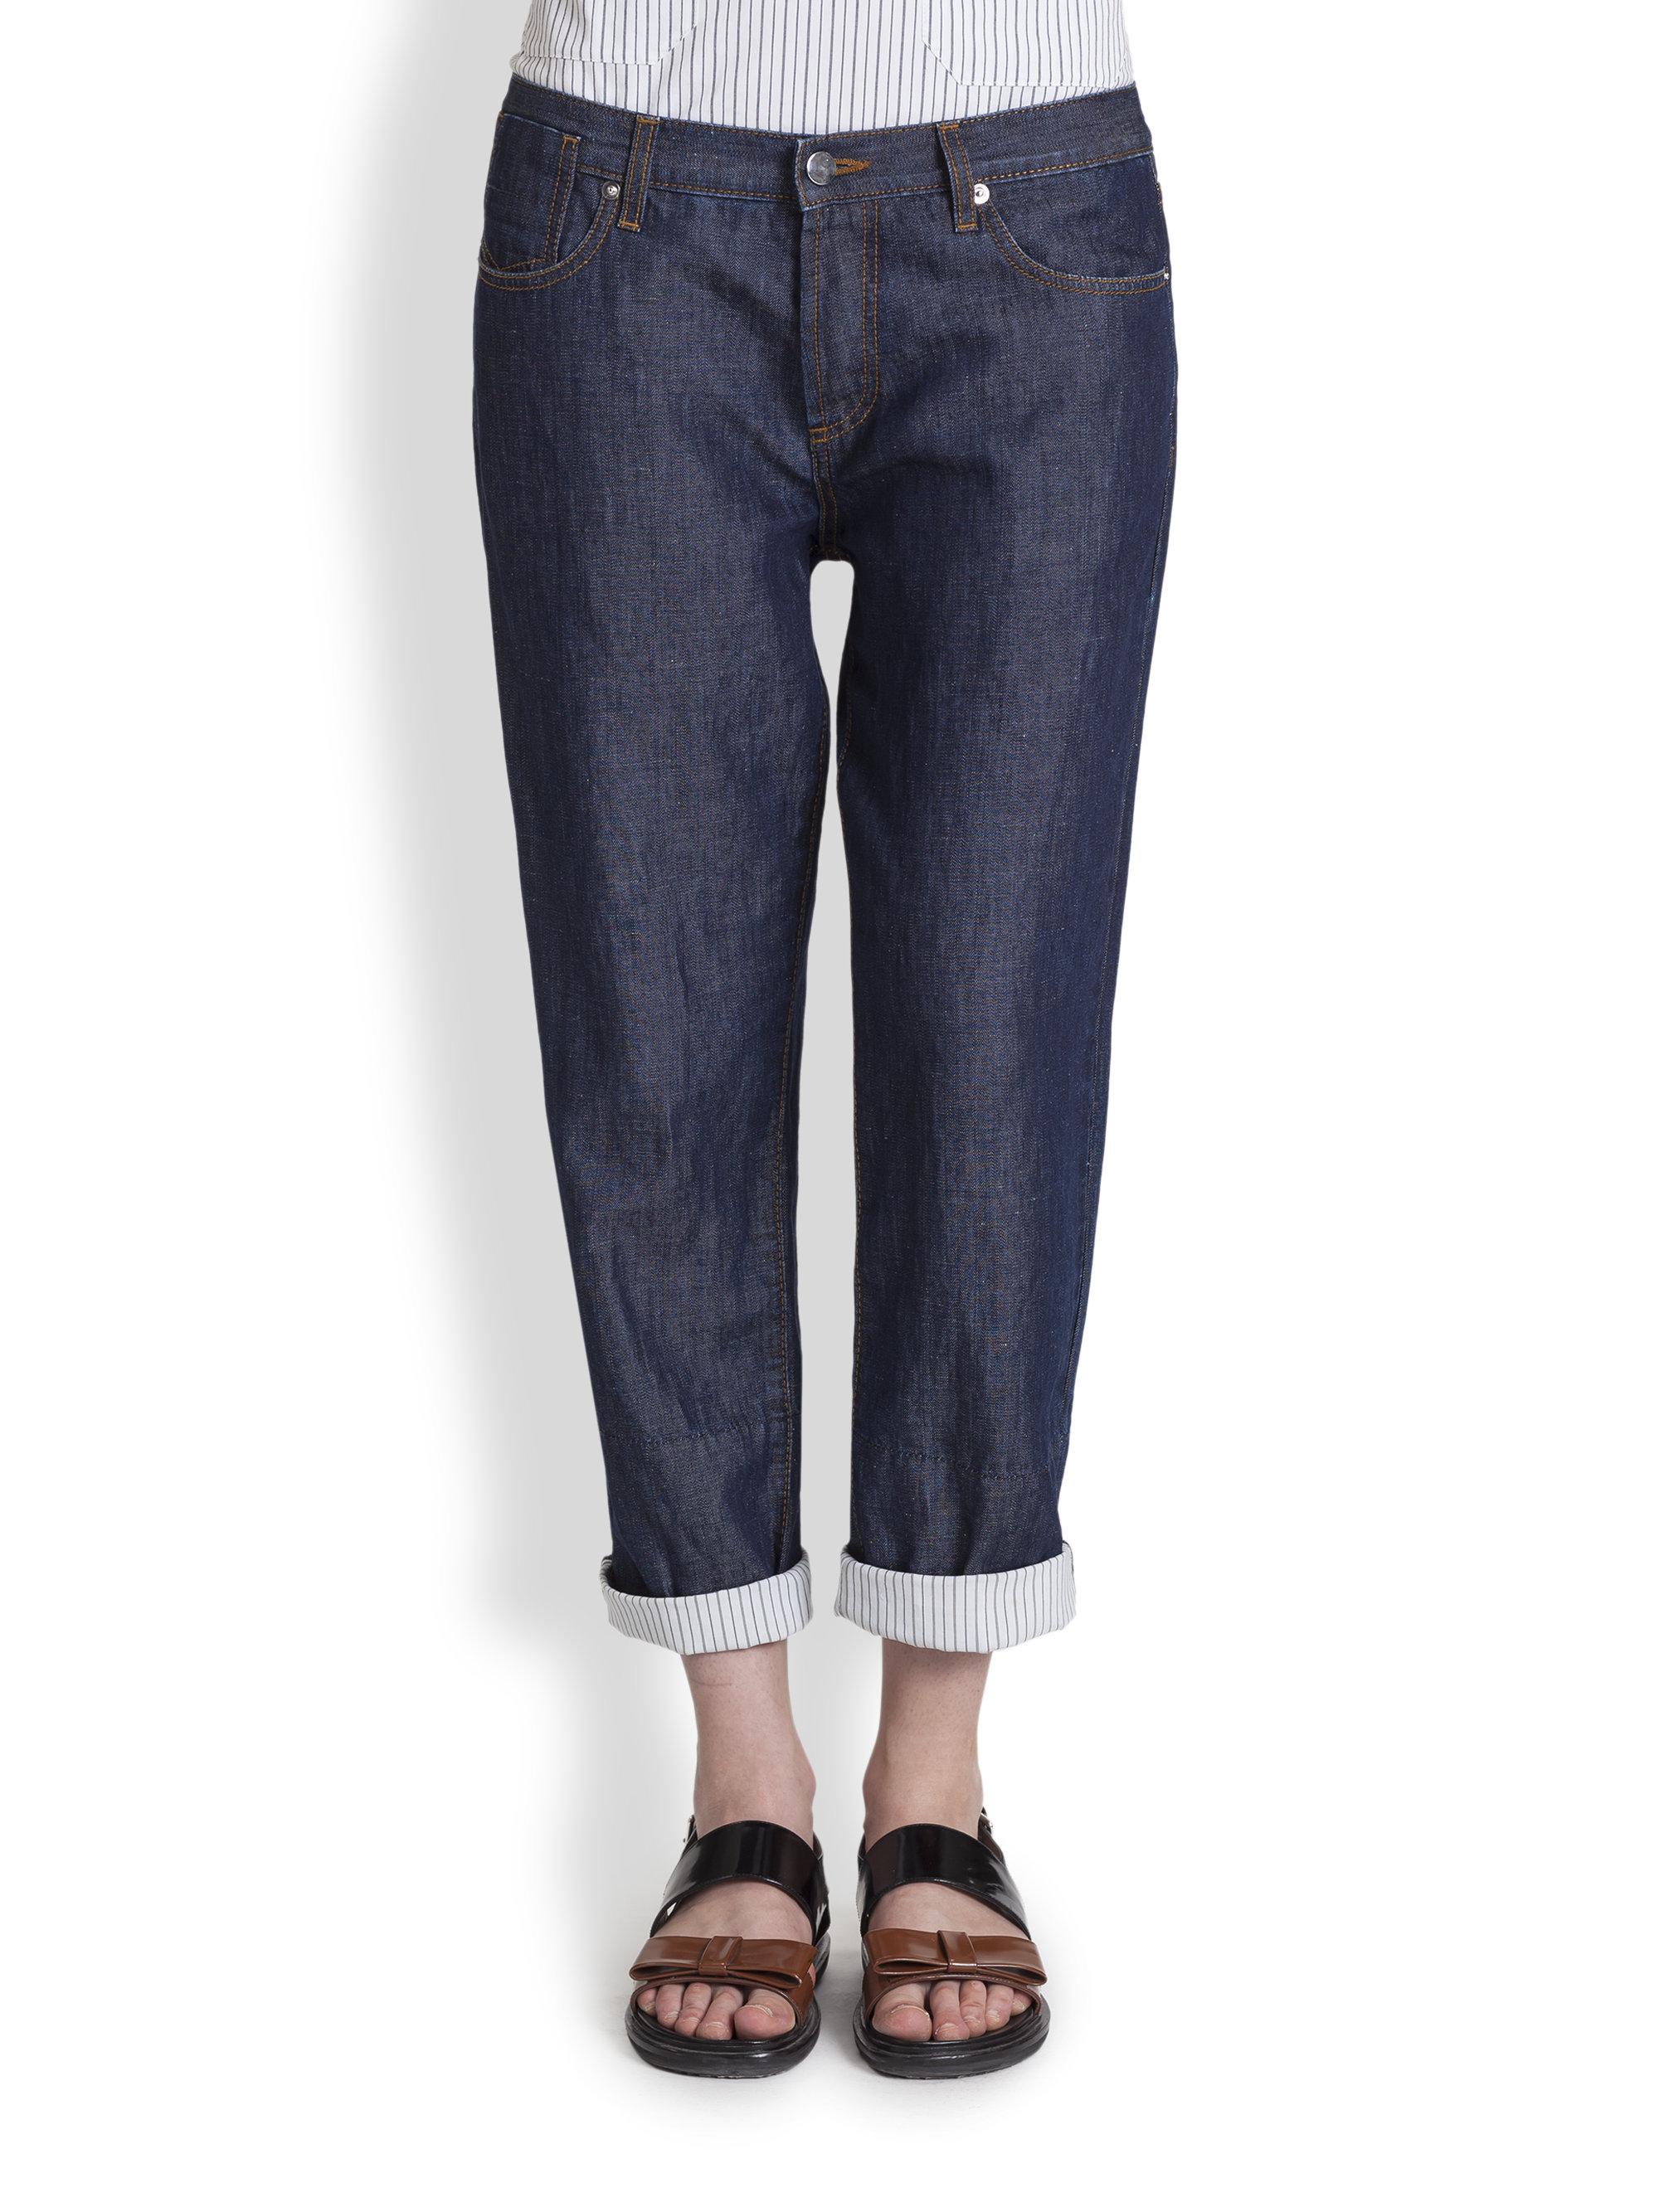 Jeans Boyfriend Blue Marni Lyst Denim In BzqUHxn8W